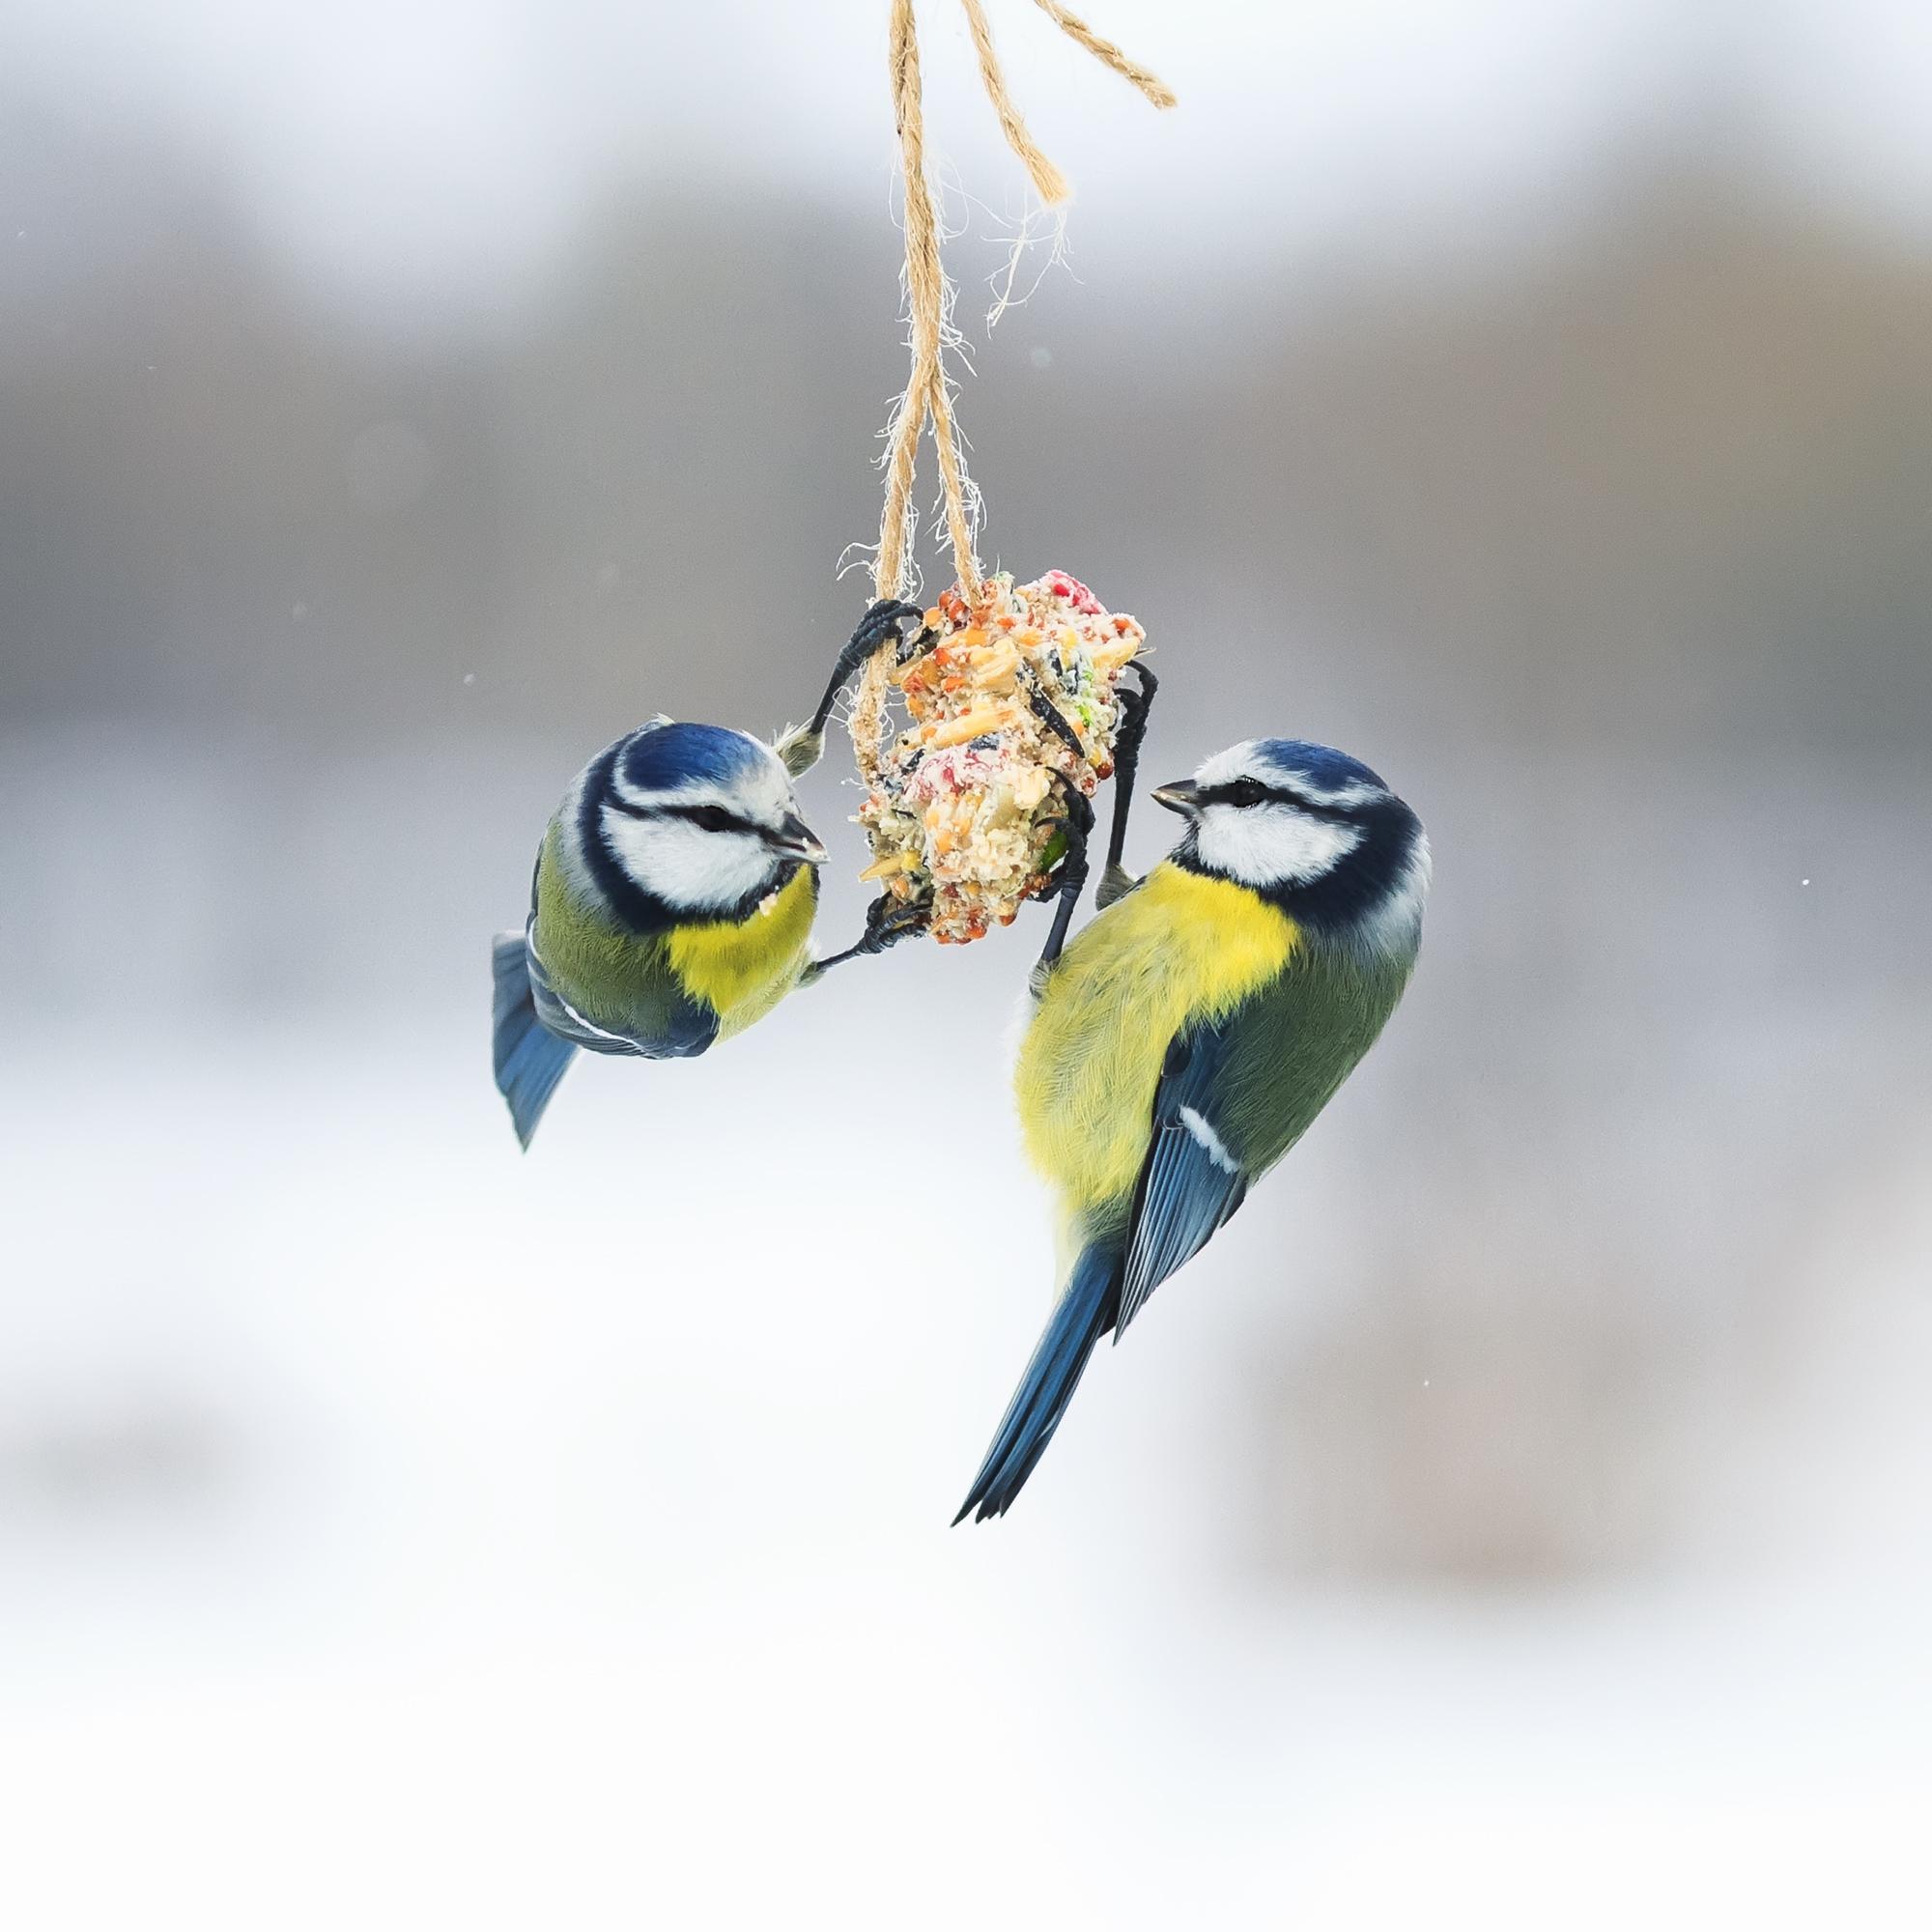 wreath   bird feeder   bird feeder wreath   diy bird feeder   diy bird feeder wreath   feed   bird   diy   yard